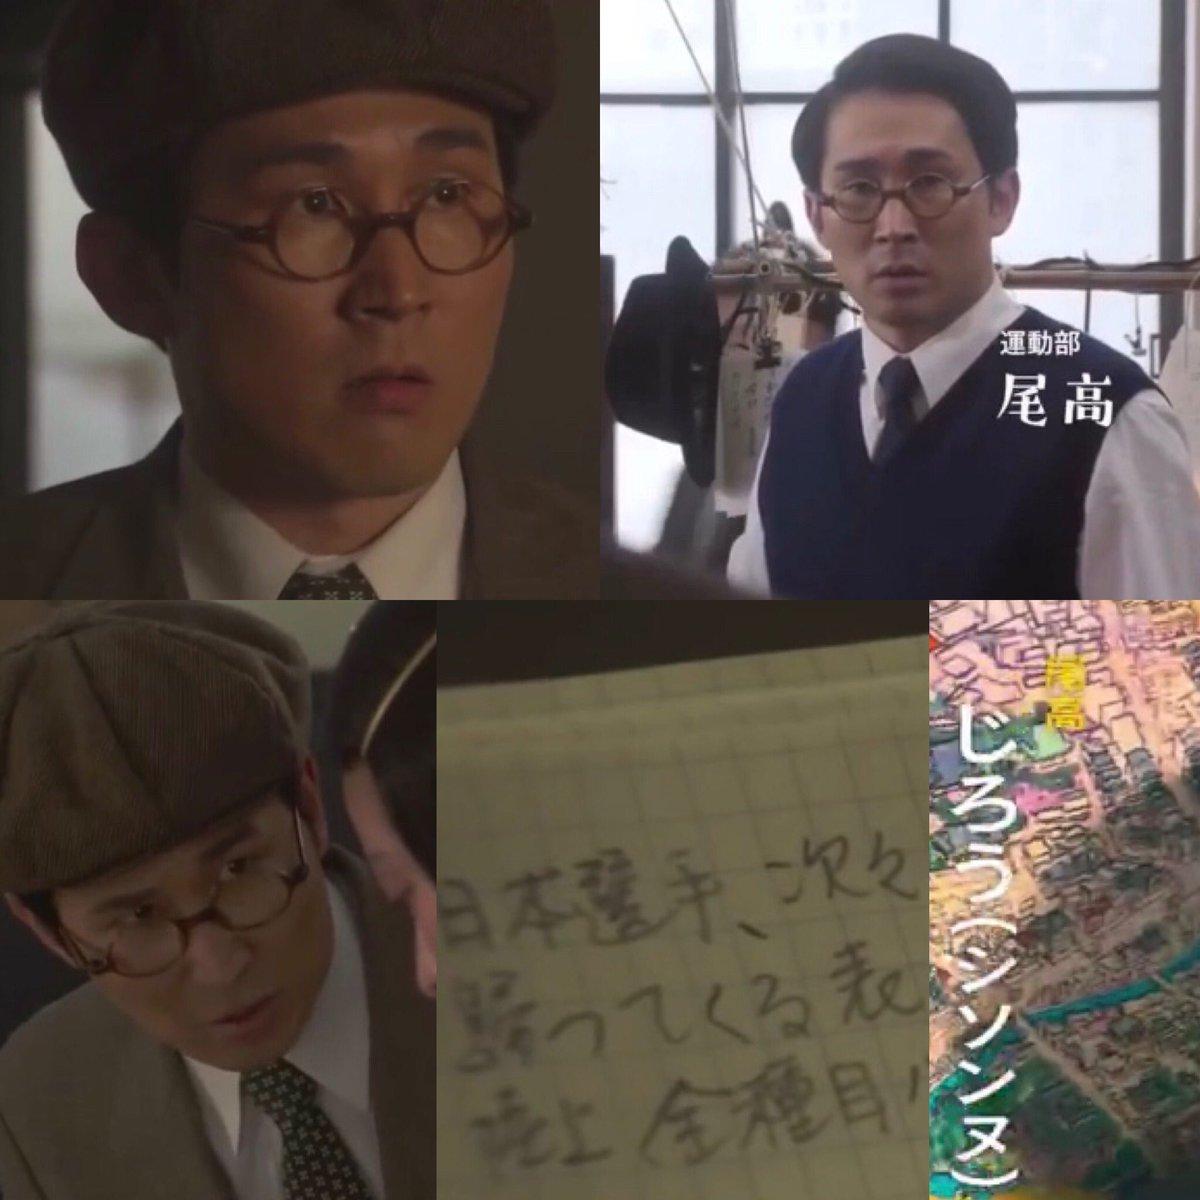 #NHK #大河劇 #韋駄天 #東京奧運故事 #drama #Olympics #Japan #Tokyo #records #Odaka #尾高 #journalist #Jiro https://t.co/WGrQeIQVBQ